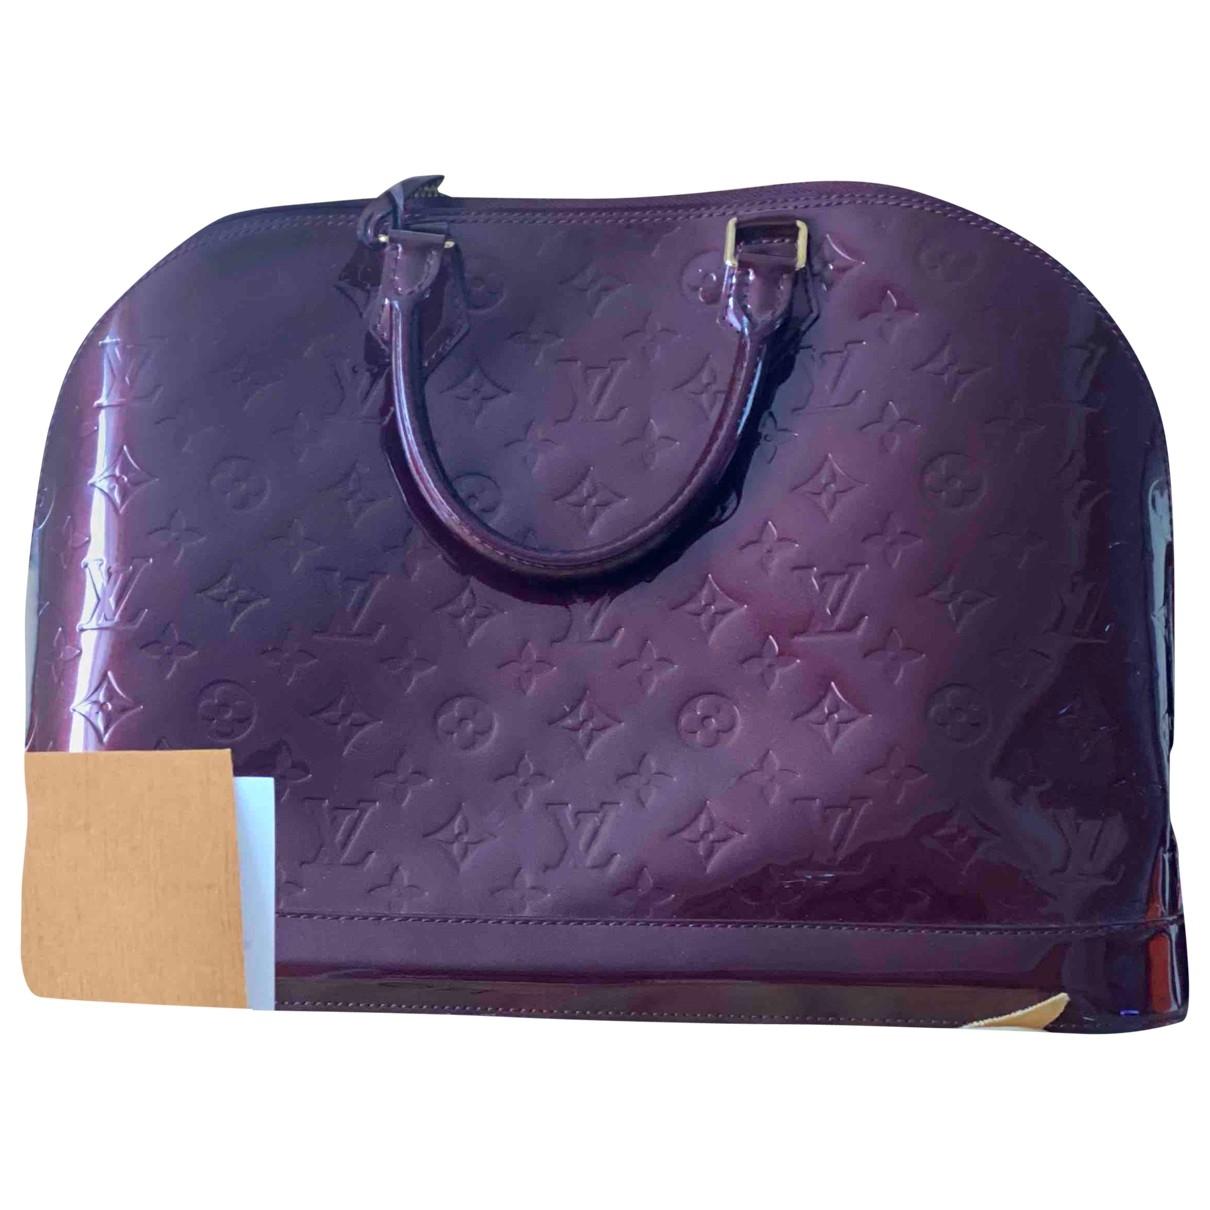 Louis Vuitton Alma Handtasche in  Rot Lackleder